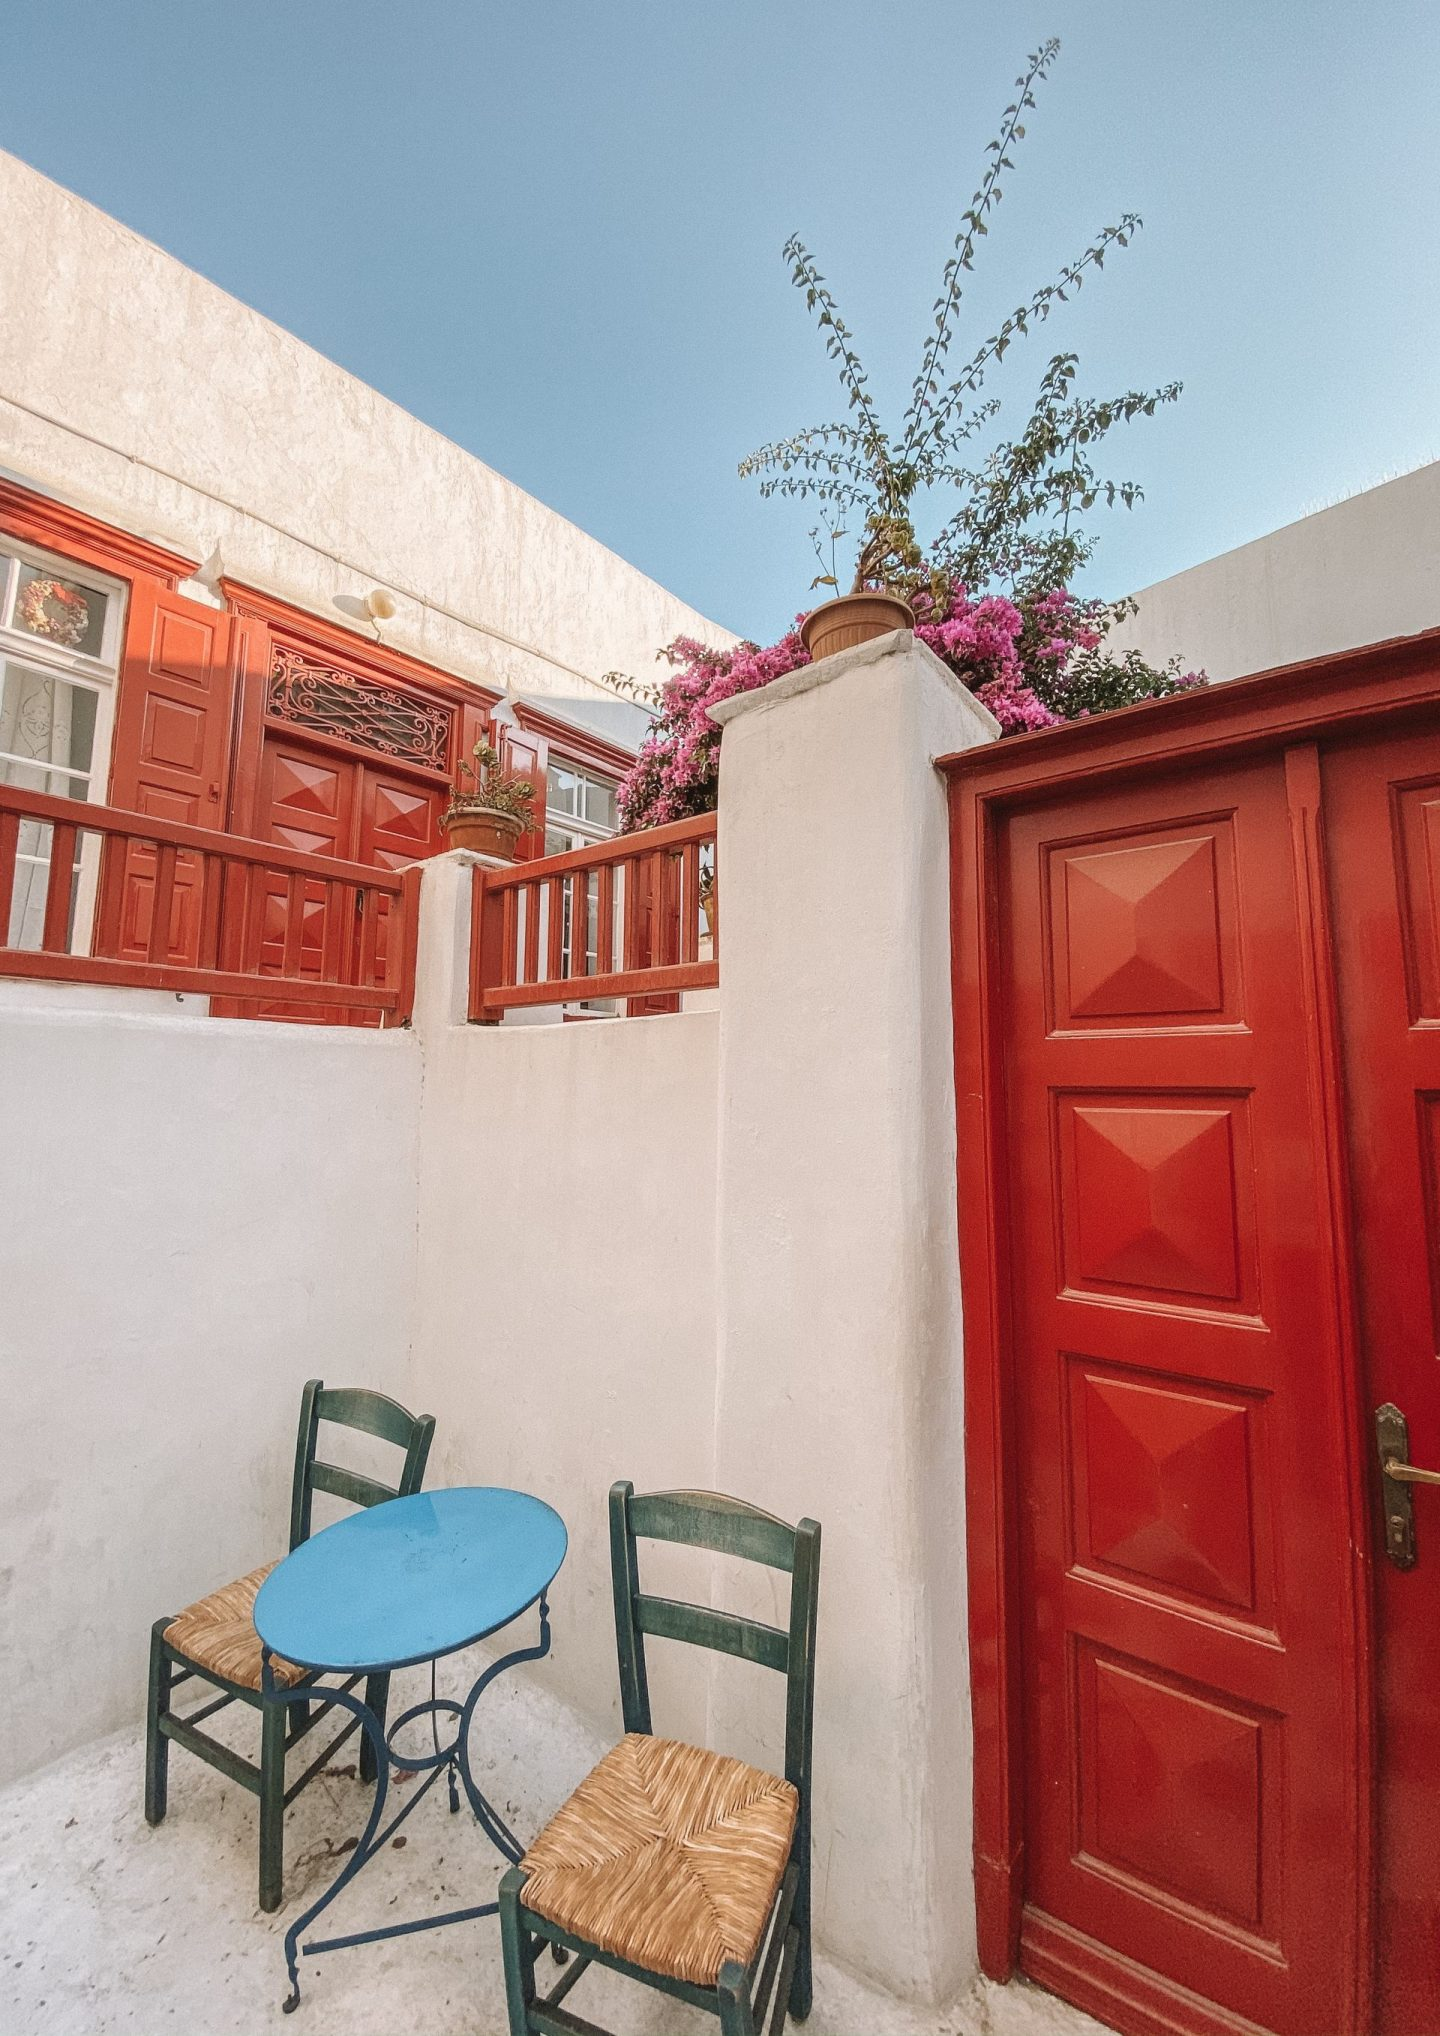 Mykonos. A short travel guide.